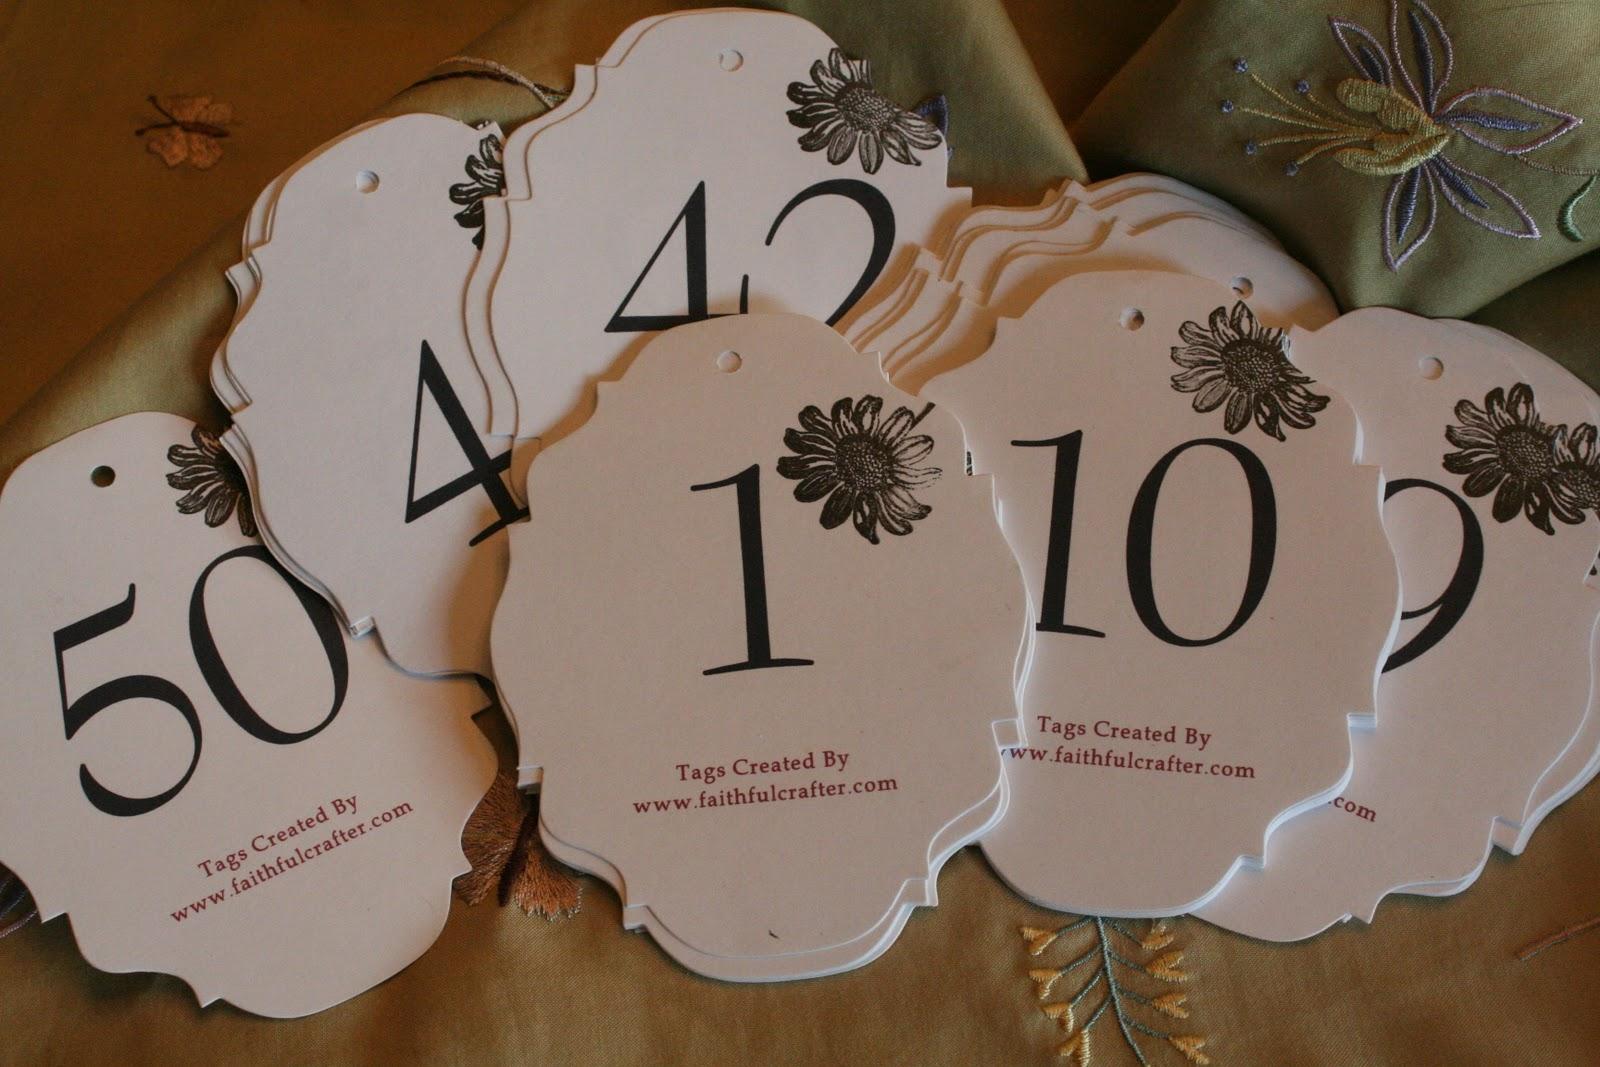 Faithful Crafter: Springtime Affirmation Tree Tags